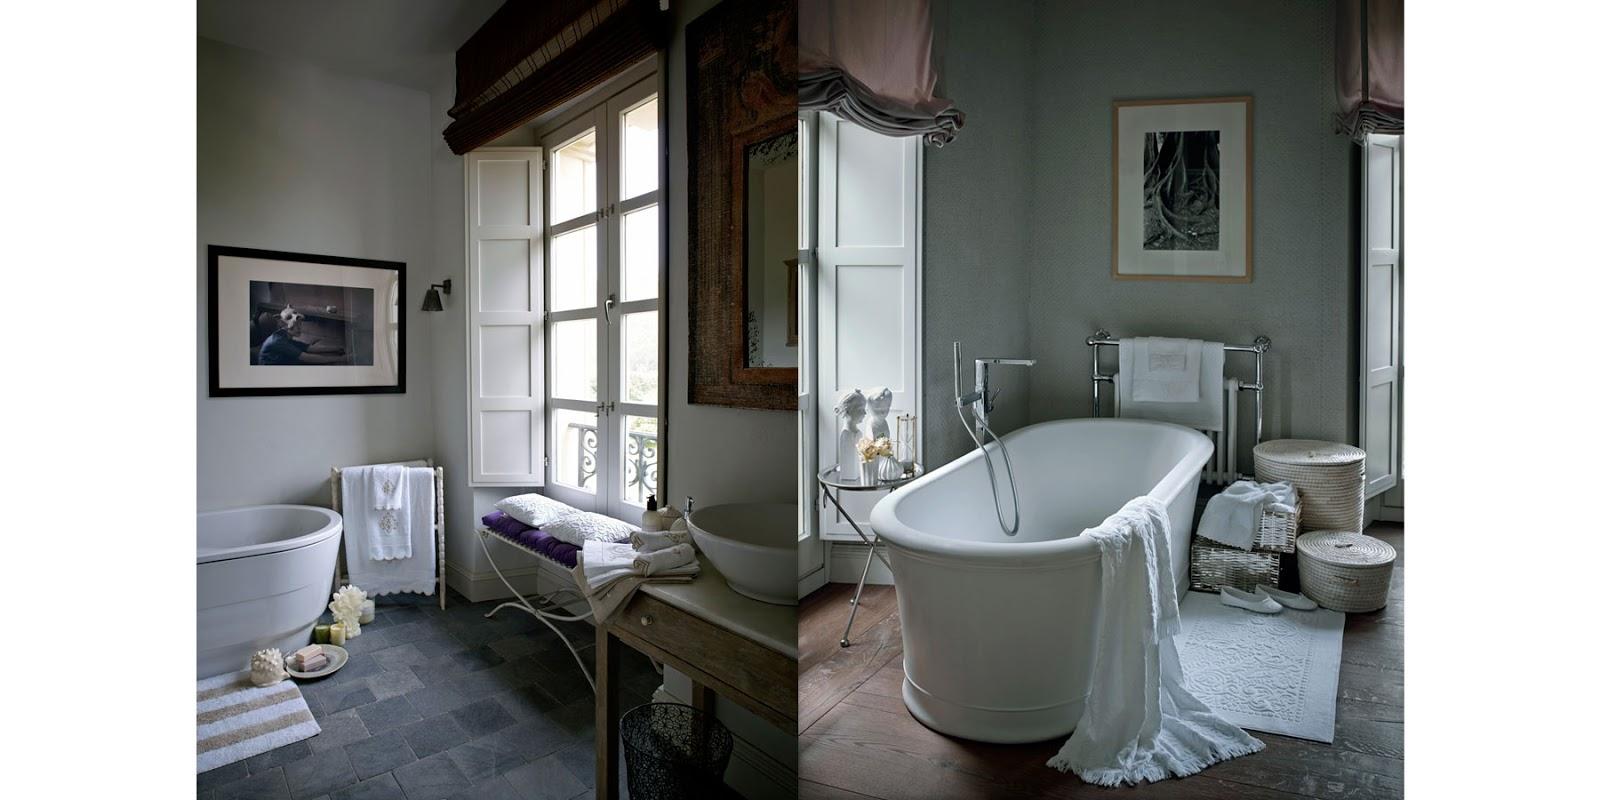 Le blog mademoiselle fall 2013 zara home collection preview - Zara home online espana ...